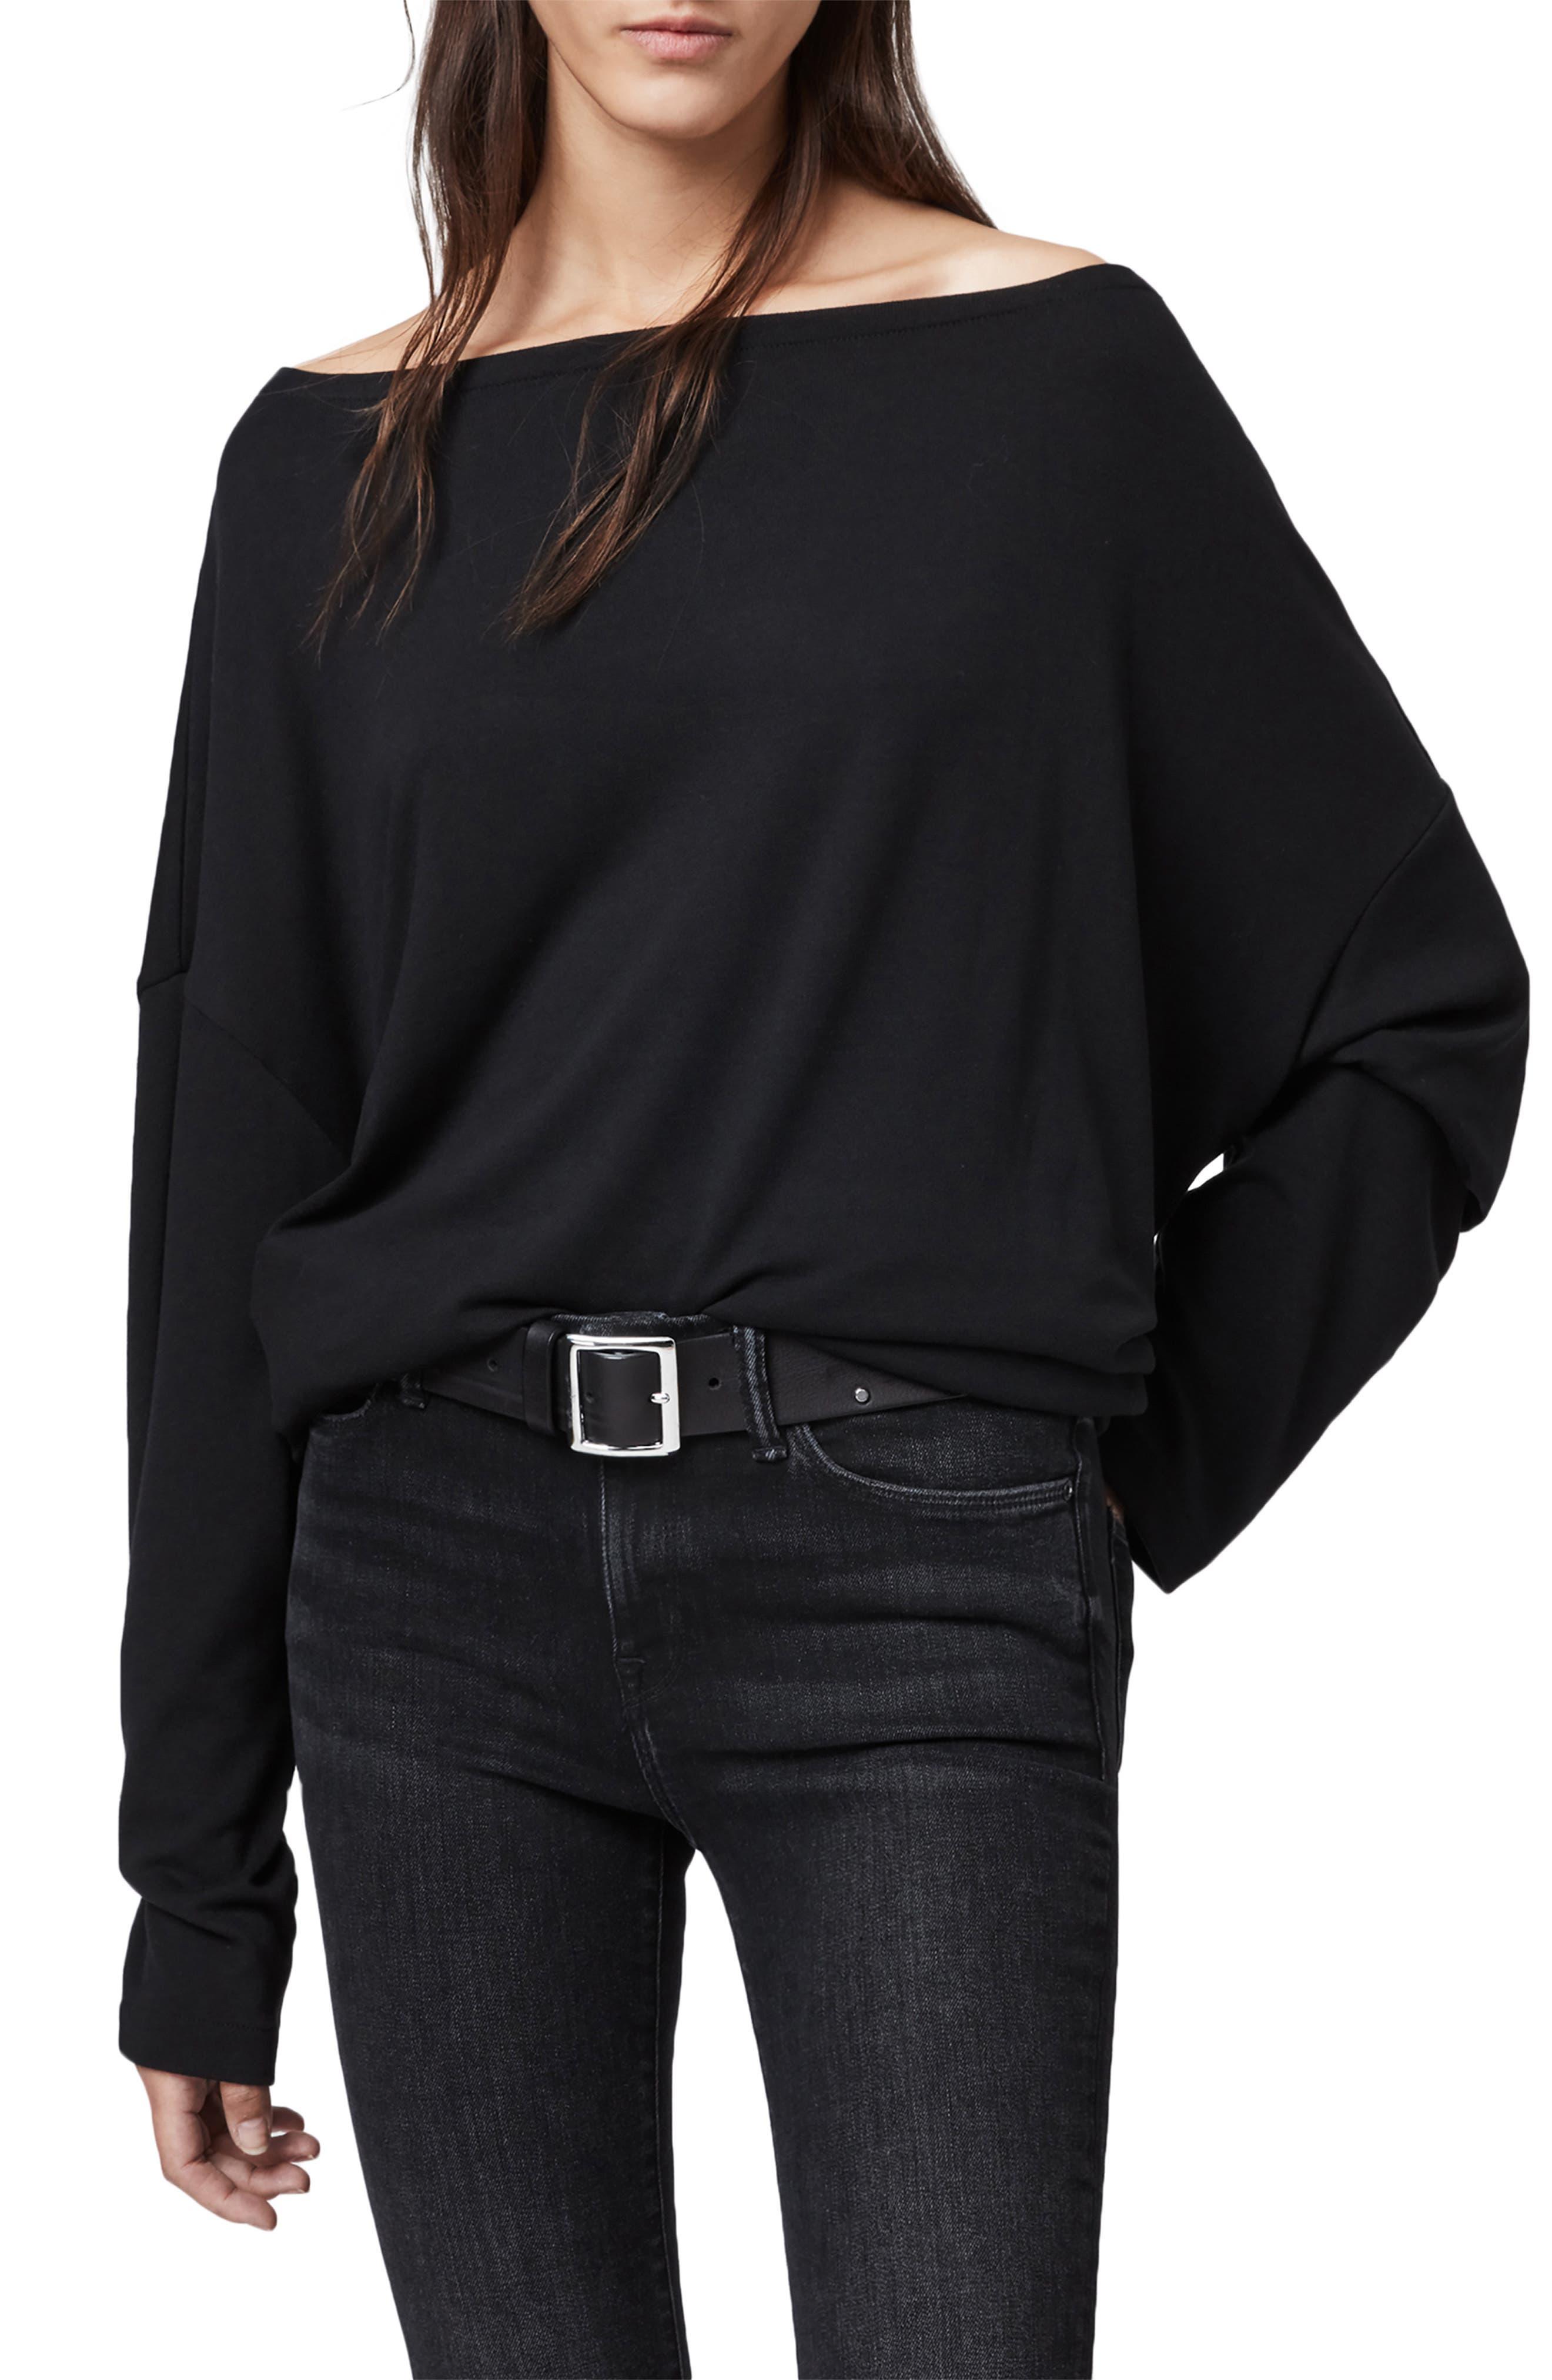 Rita Oversize One-Shoulder Long Sleeve Tee